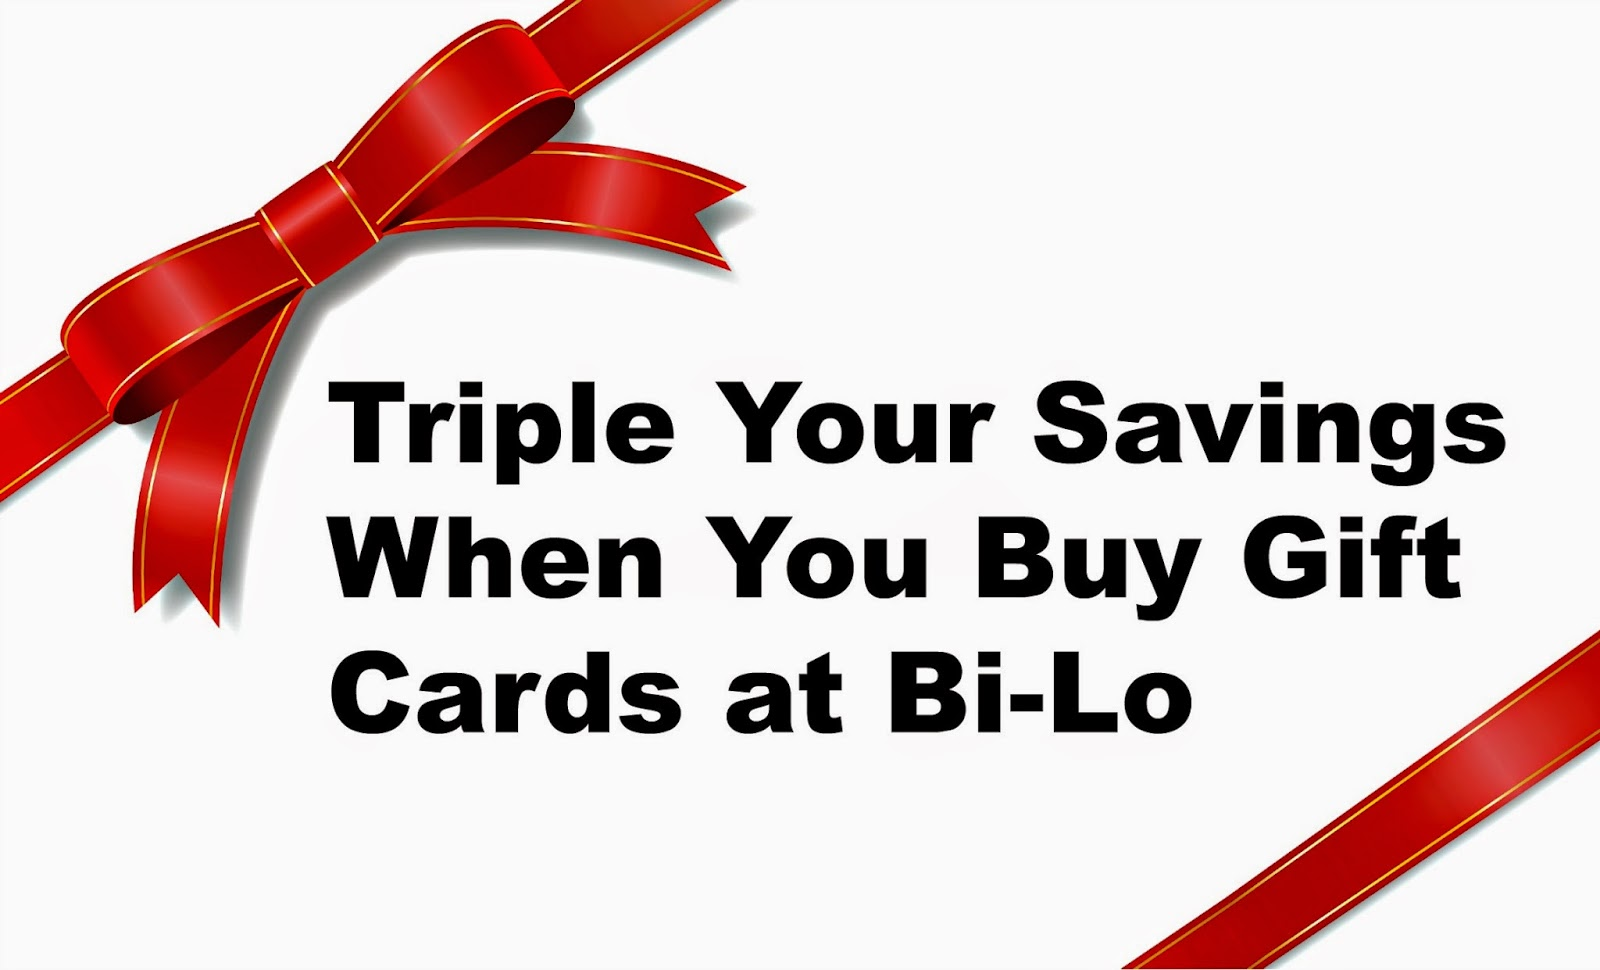 Triple Your Savings When You Buy Gift Cards at Bi-Lo + Win a $200 Amazon Gift Card!  #BiLo3Dip